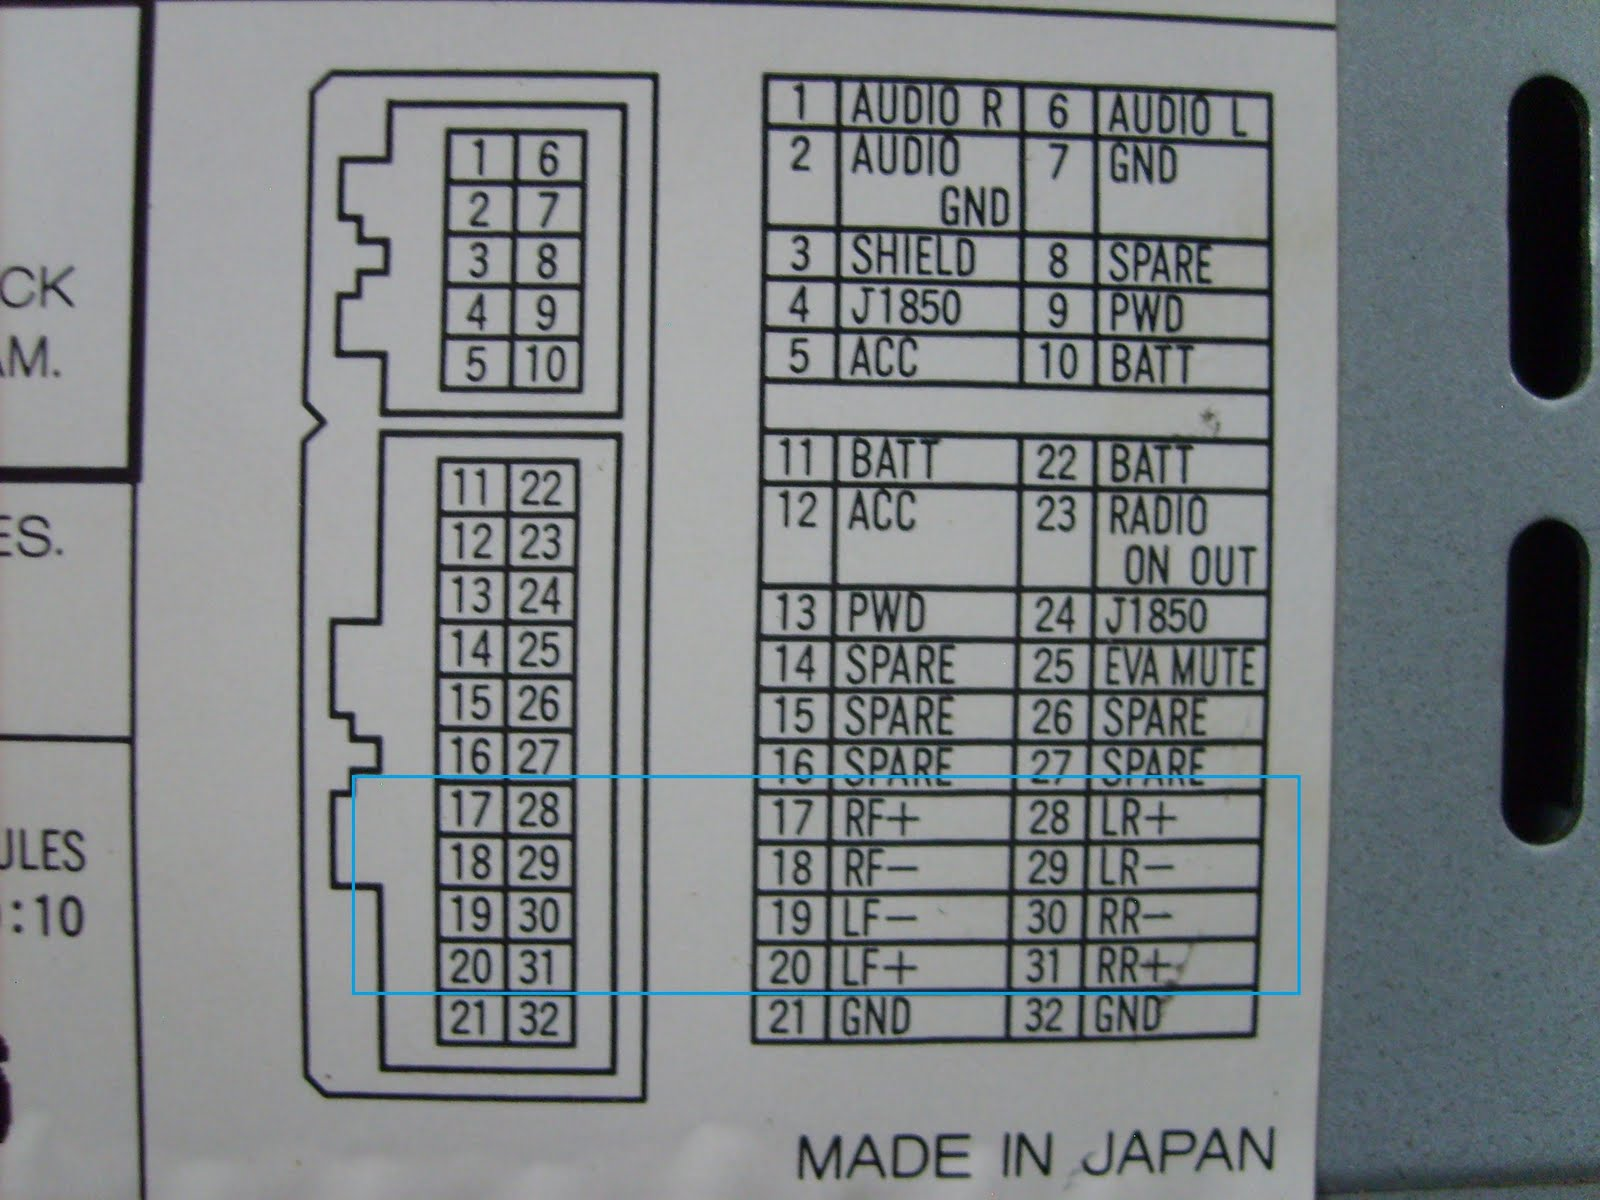 2015 dodge ram 2500 radio wiring diagram somurich com rh somurich com Dodge Factory Radio Wiring Diagram 1999 Dodge Ram Radio Wiring Diagram